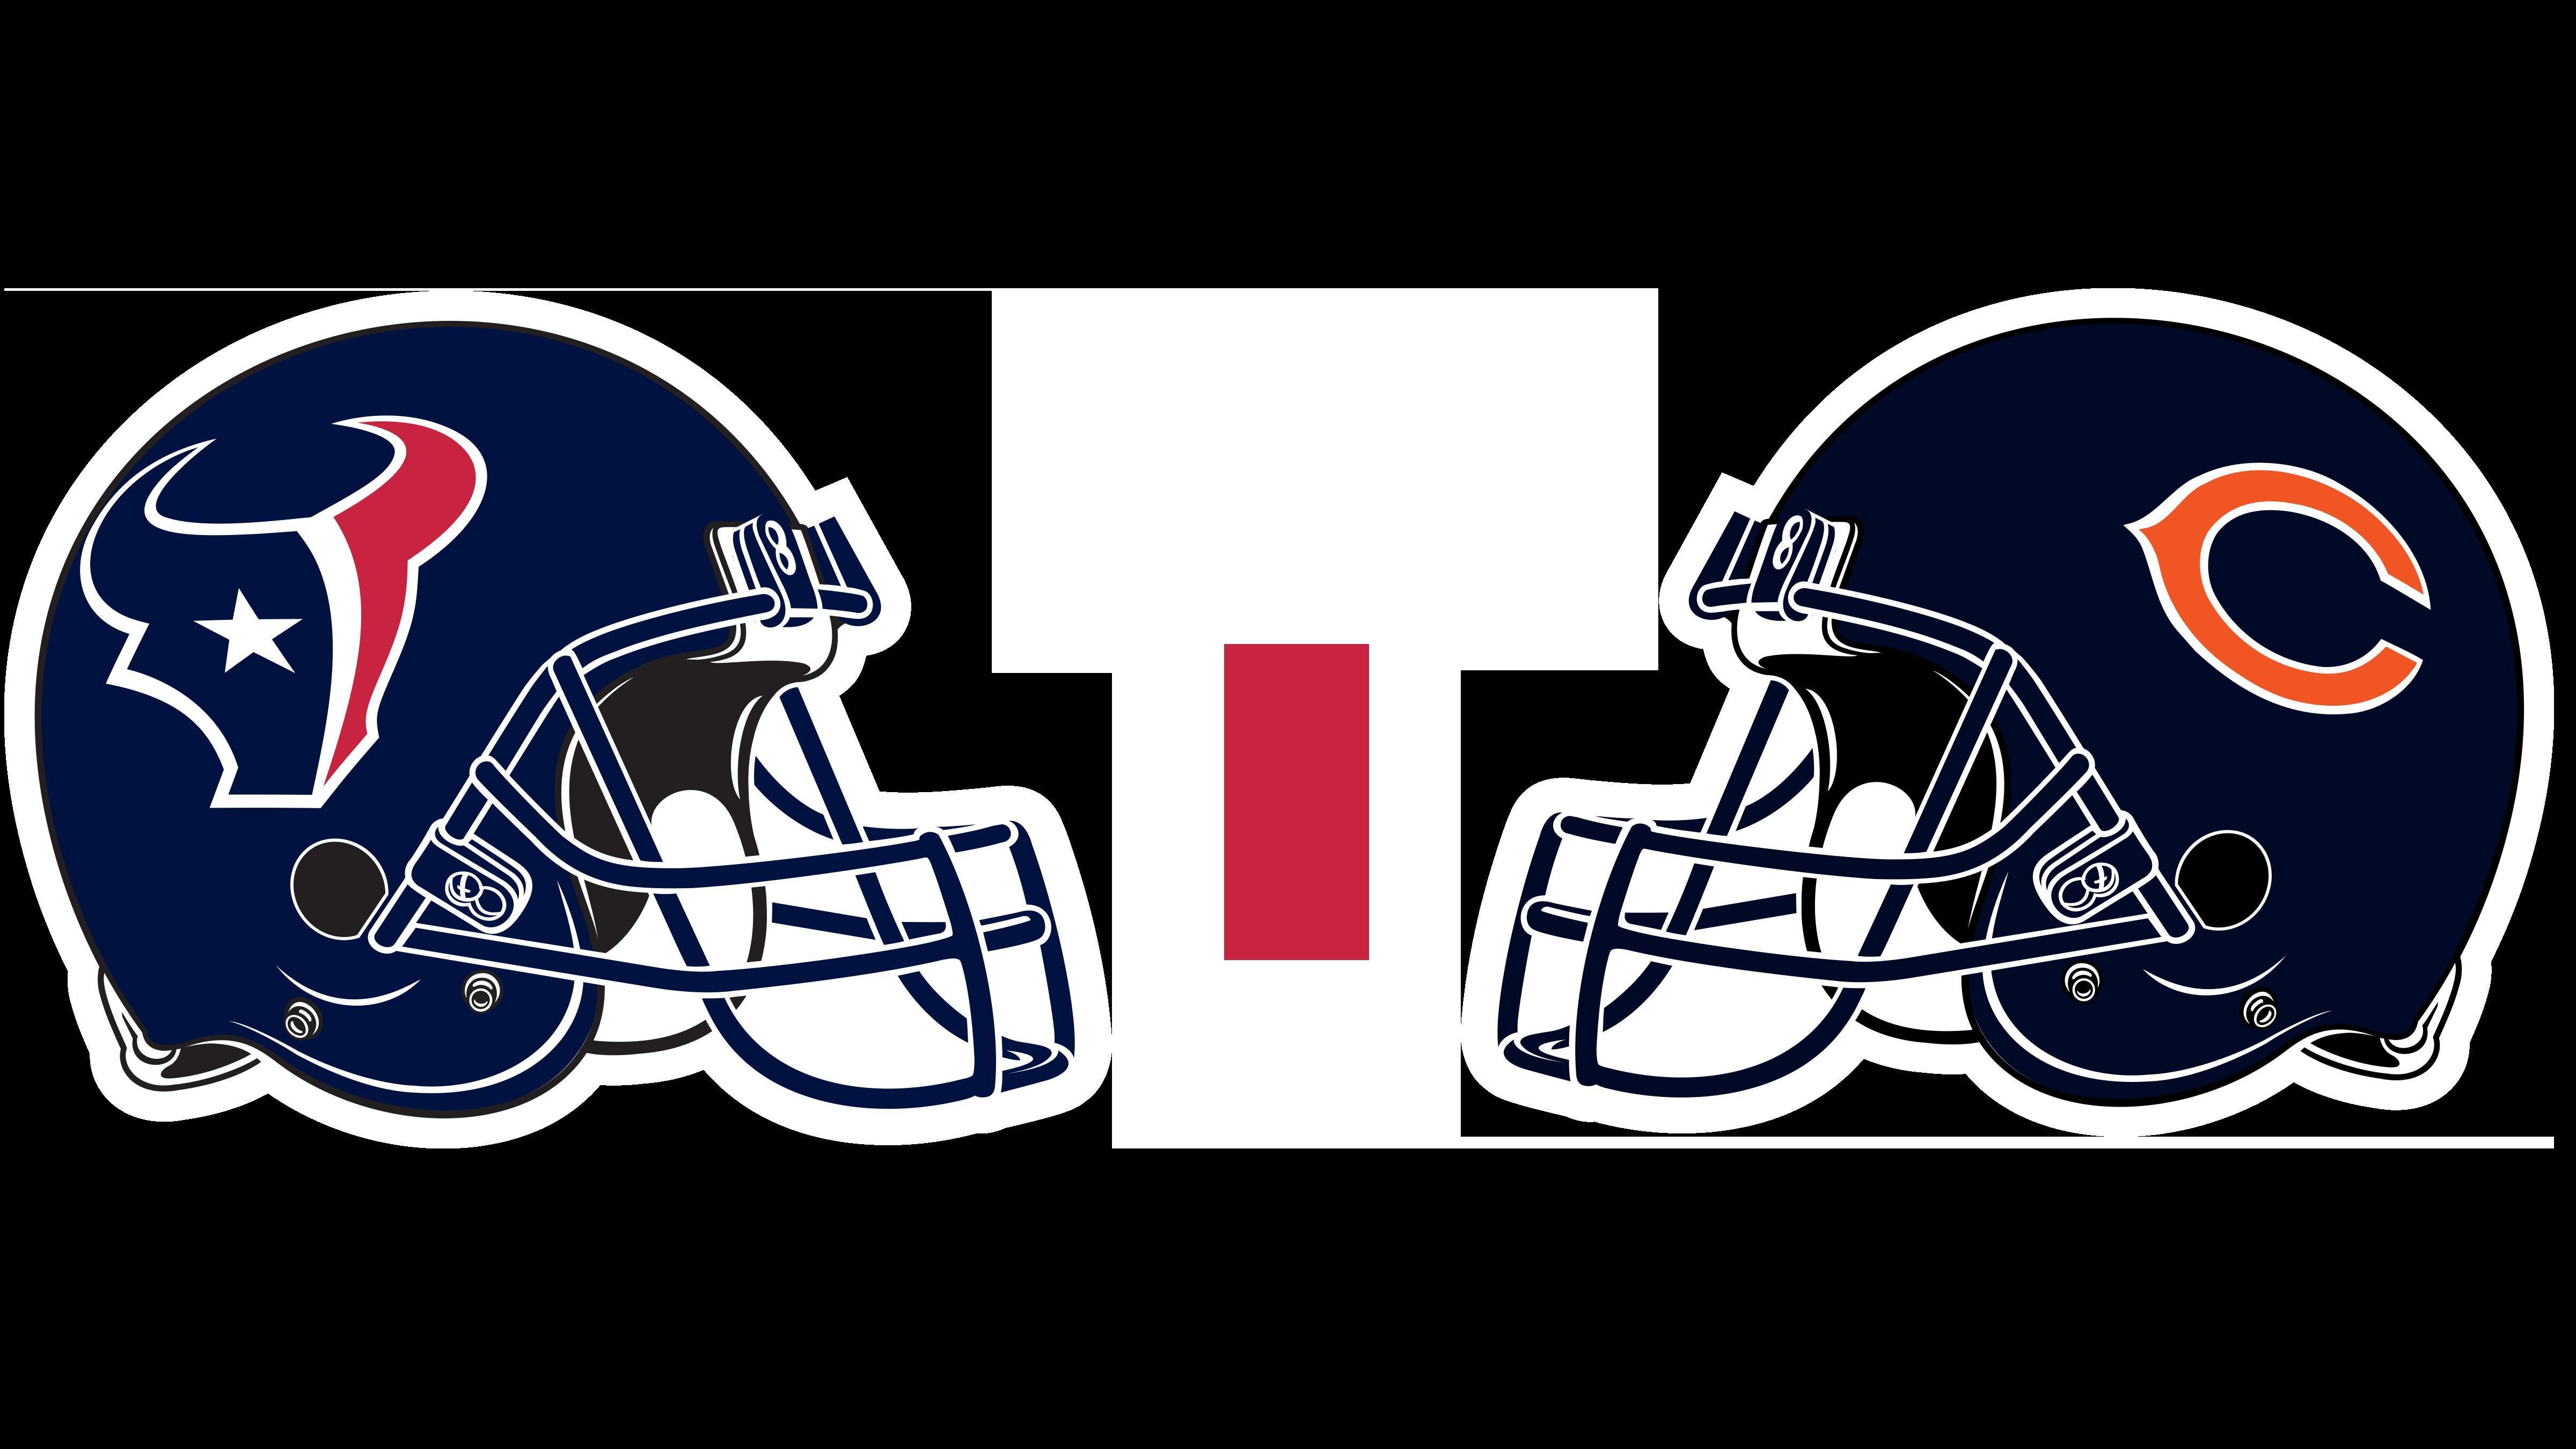 Houston Texans helmet and Chicago Bears helmet